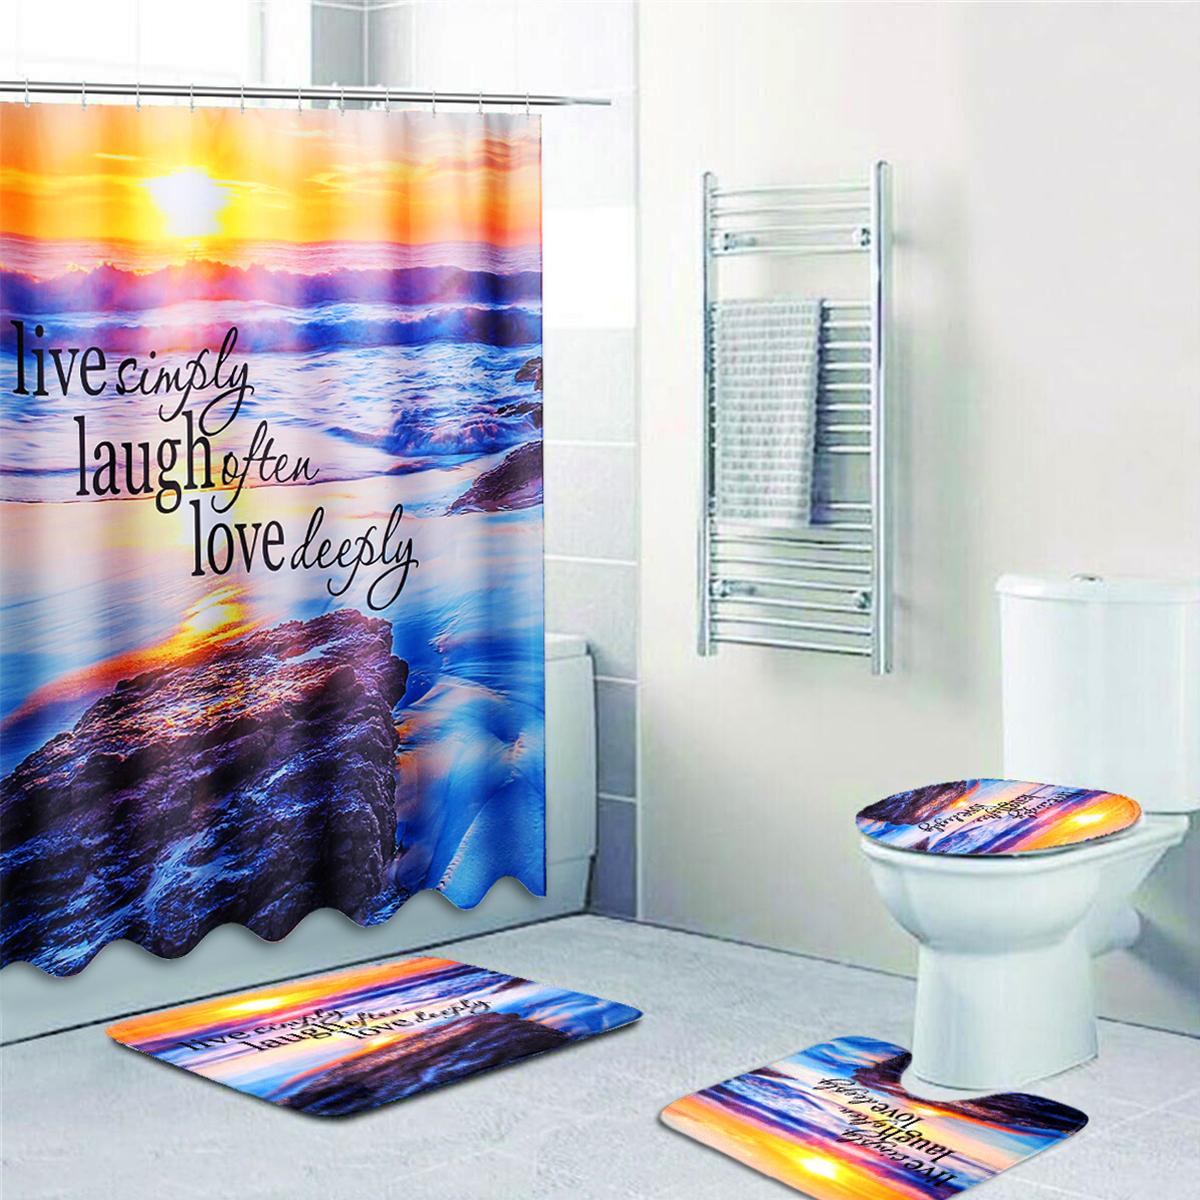 Sandy Beach Waterproof Bathroom Shower Curtain Toilet Cover Mat